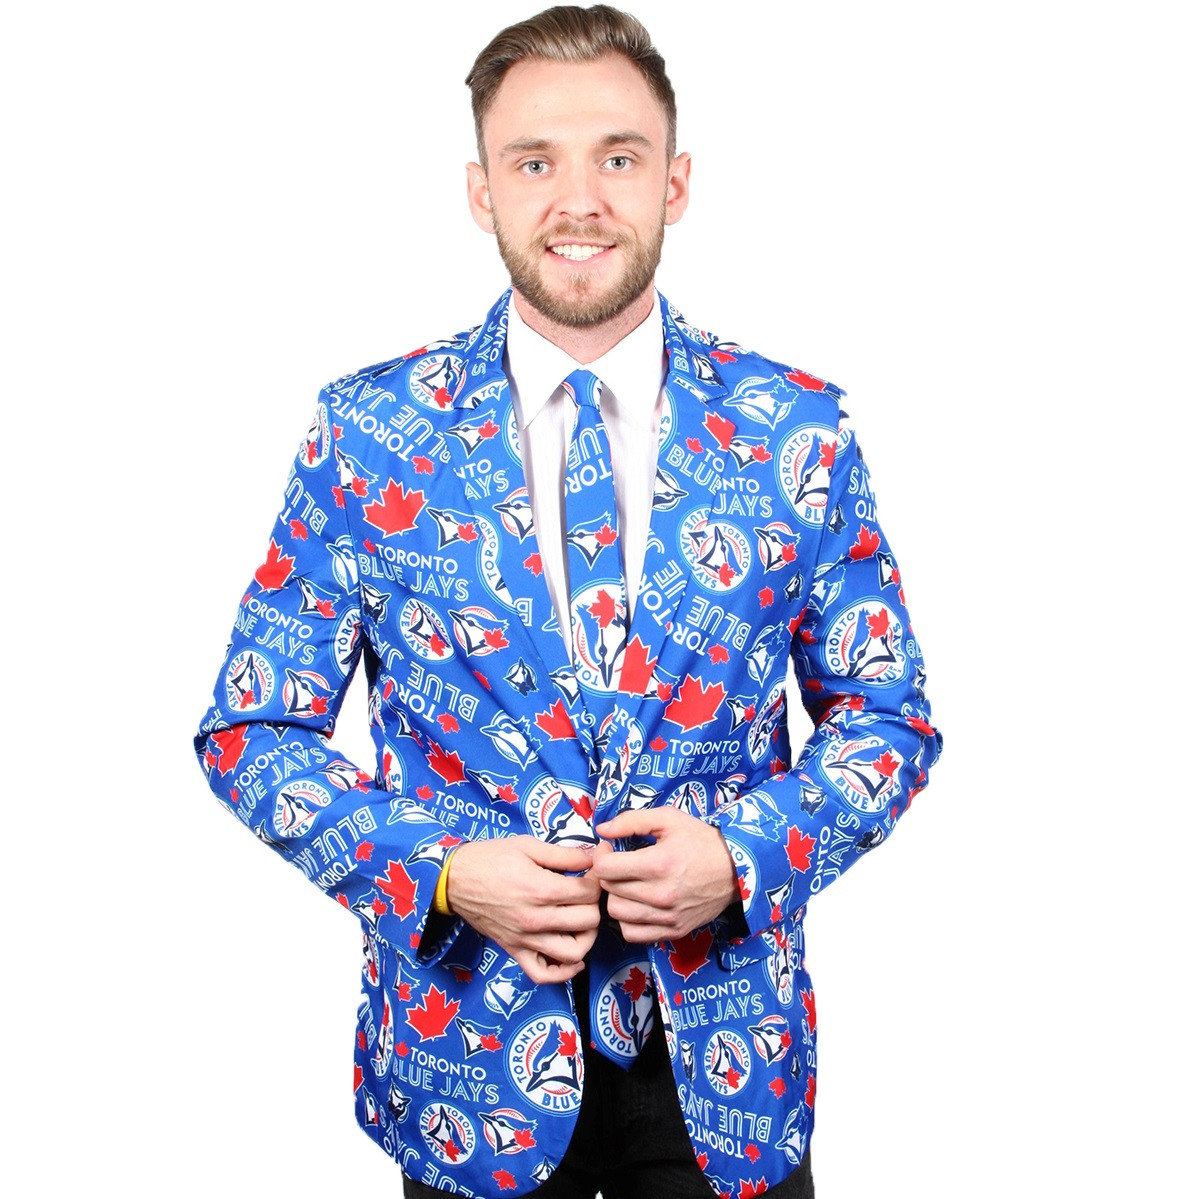 Toronto Blue Jays Suit Jacket And Tie Retrofestive Ca